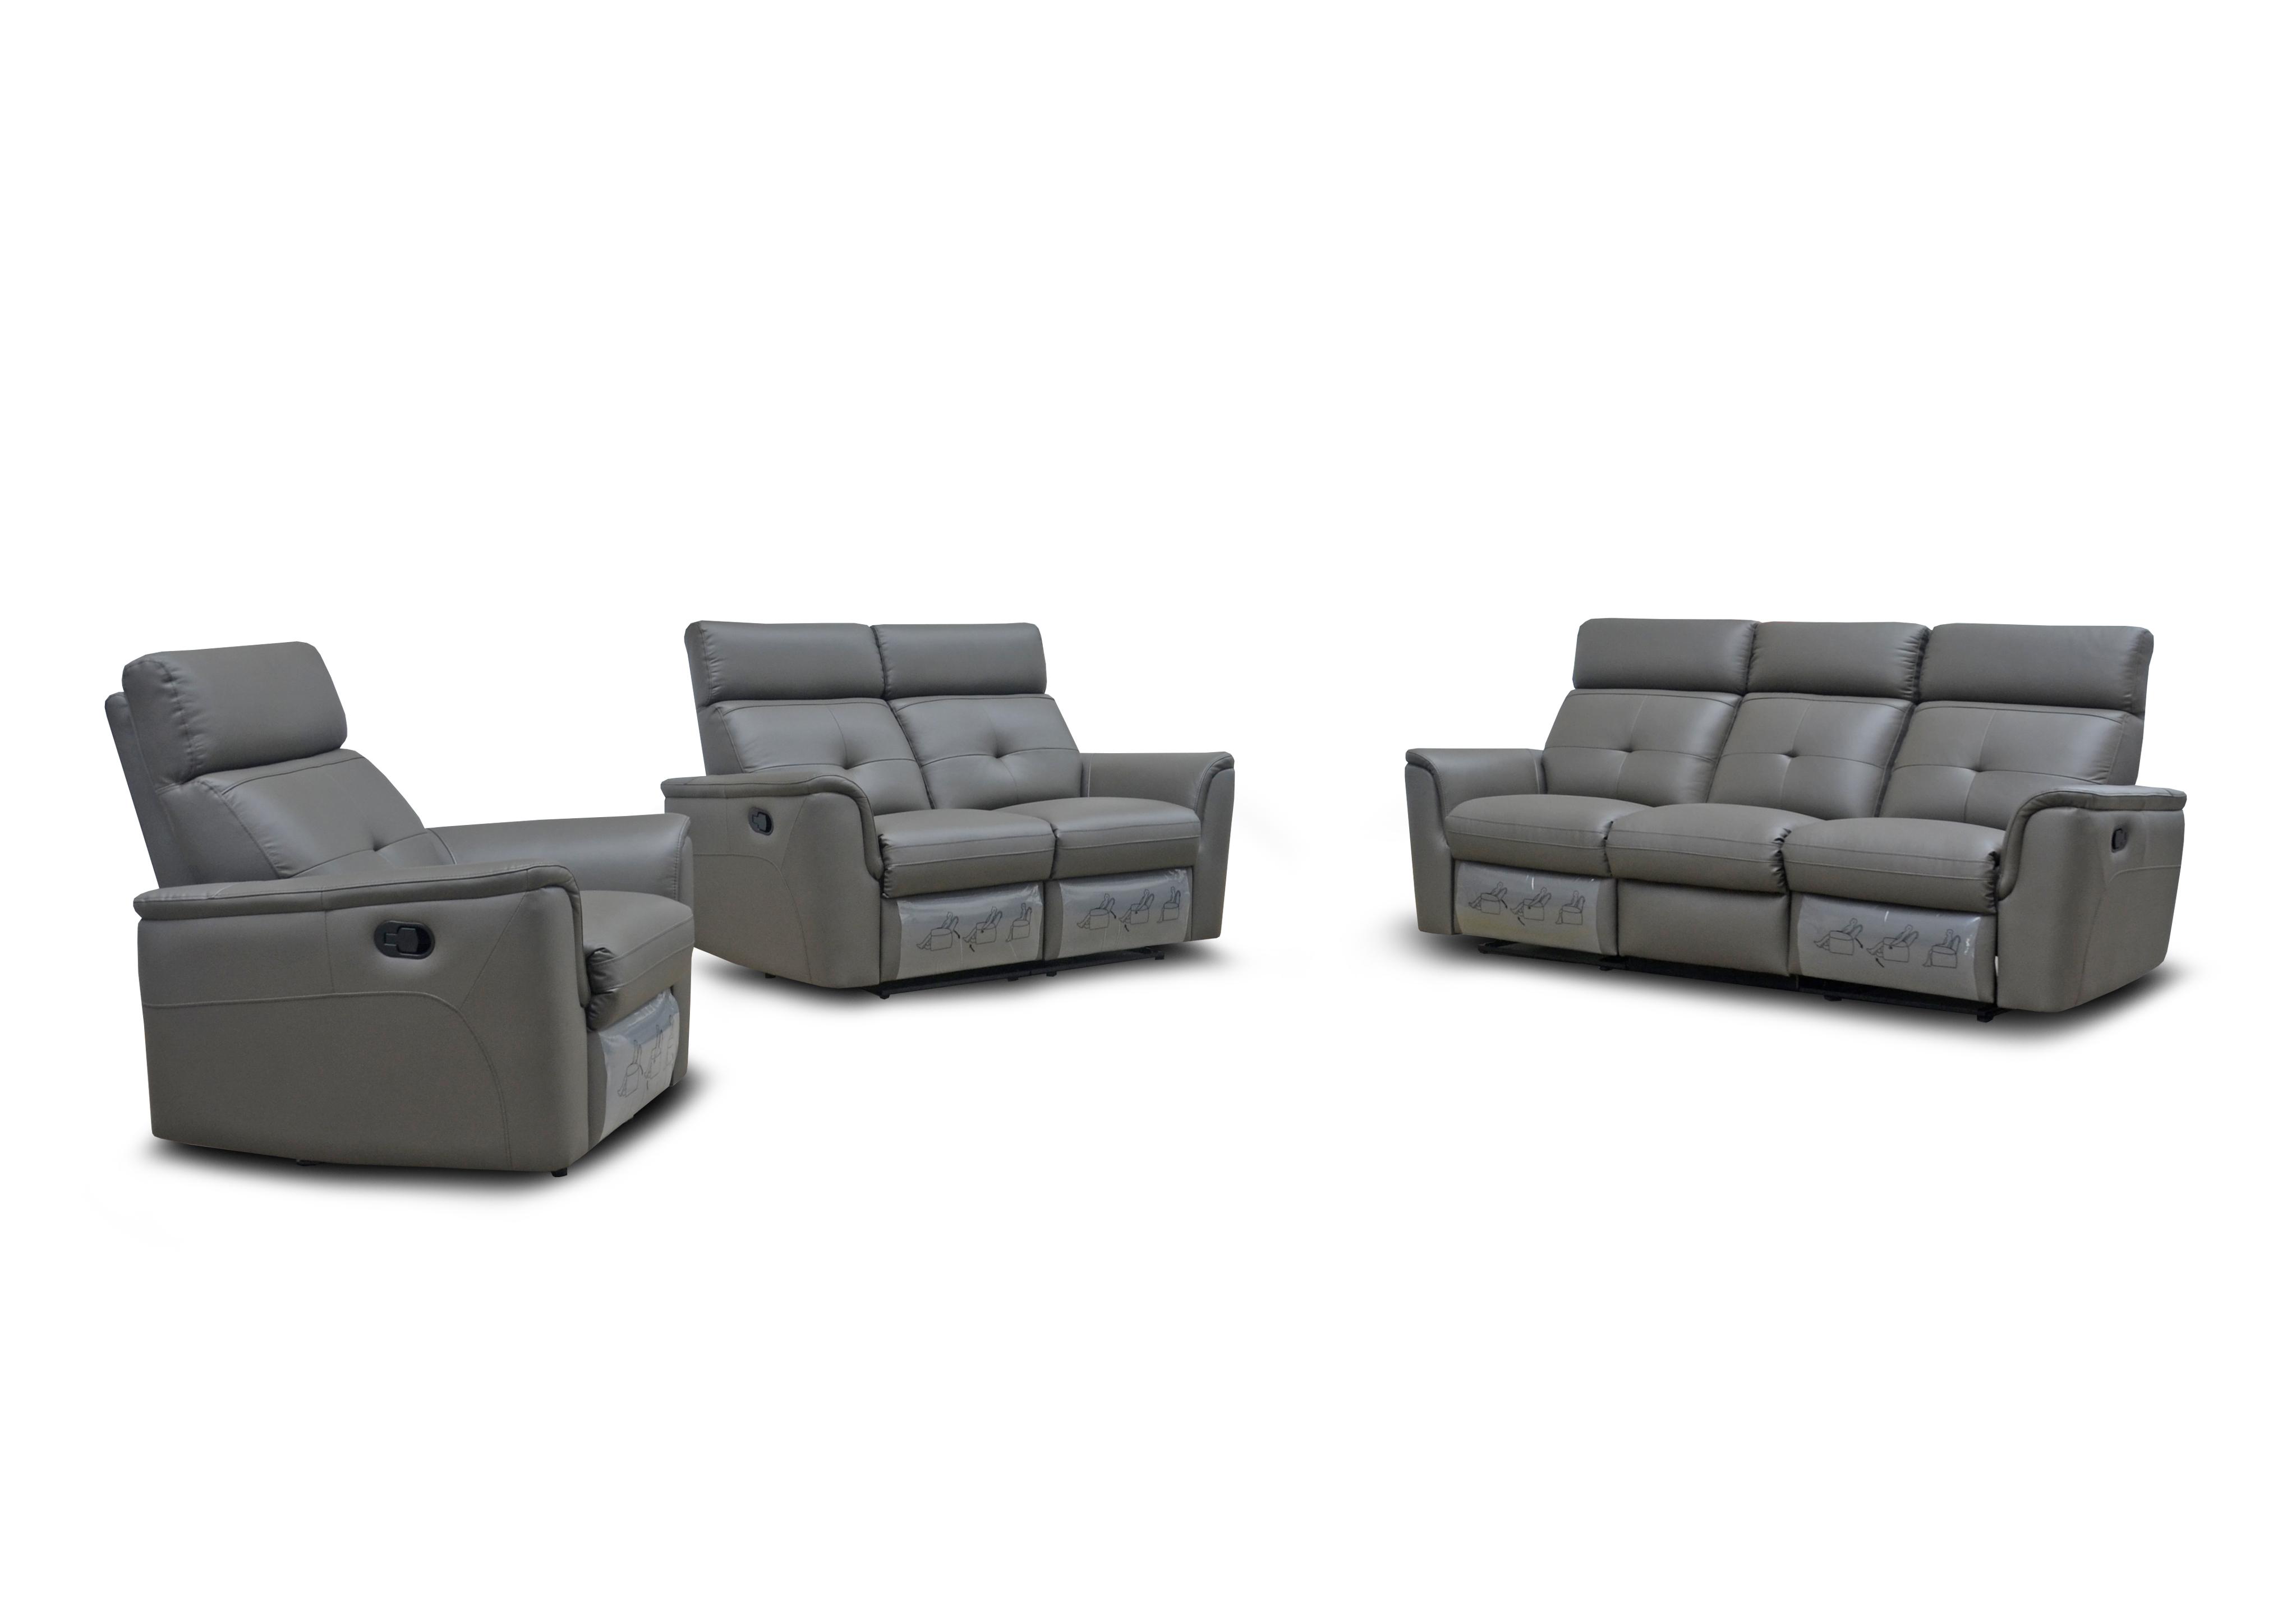 8501 Dark Grey W Manual Recliner Reclining And Sliding Seats Sets Living Room Furniture